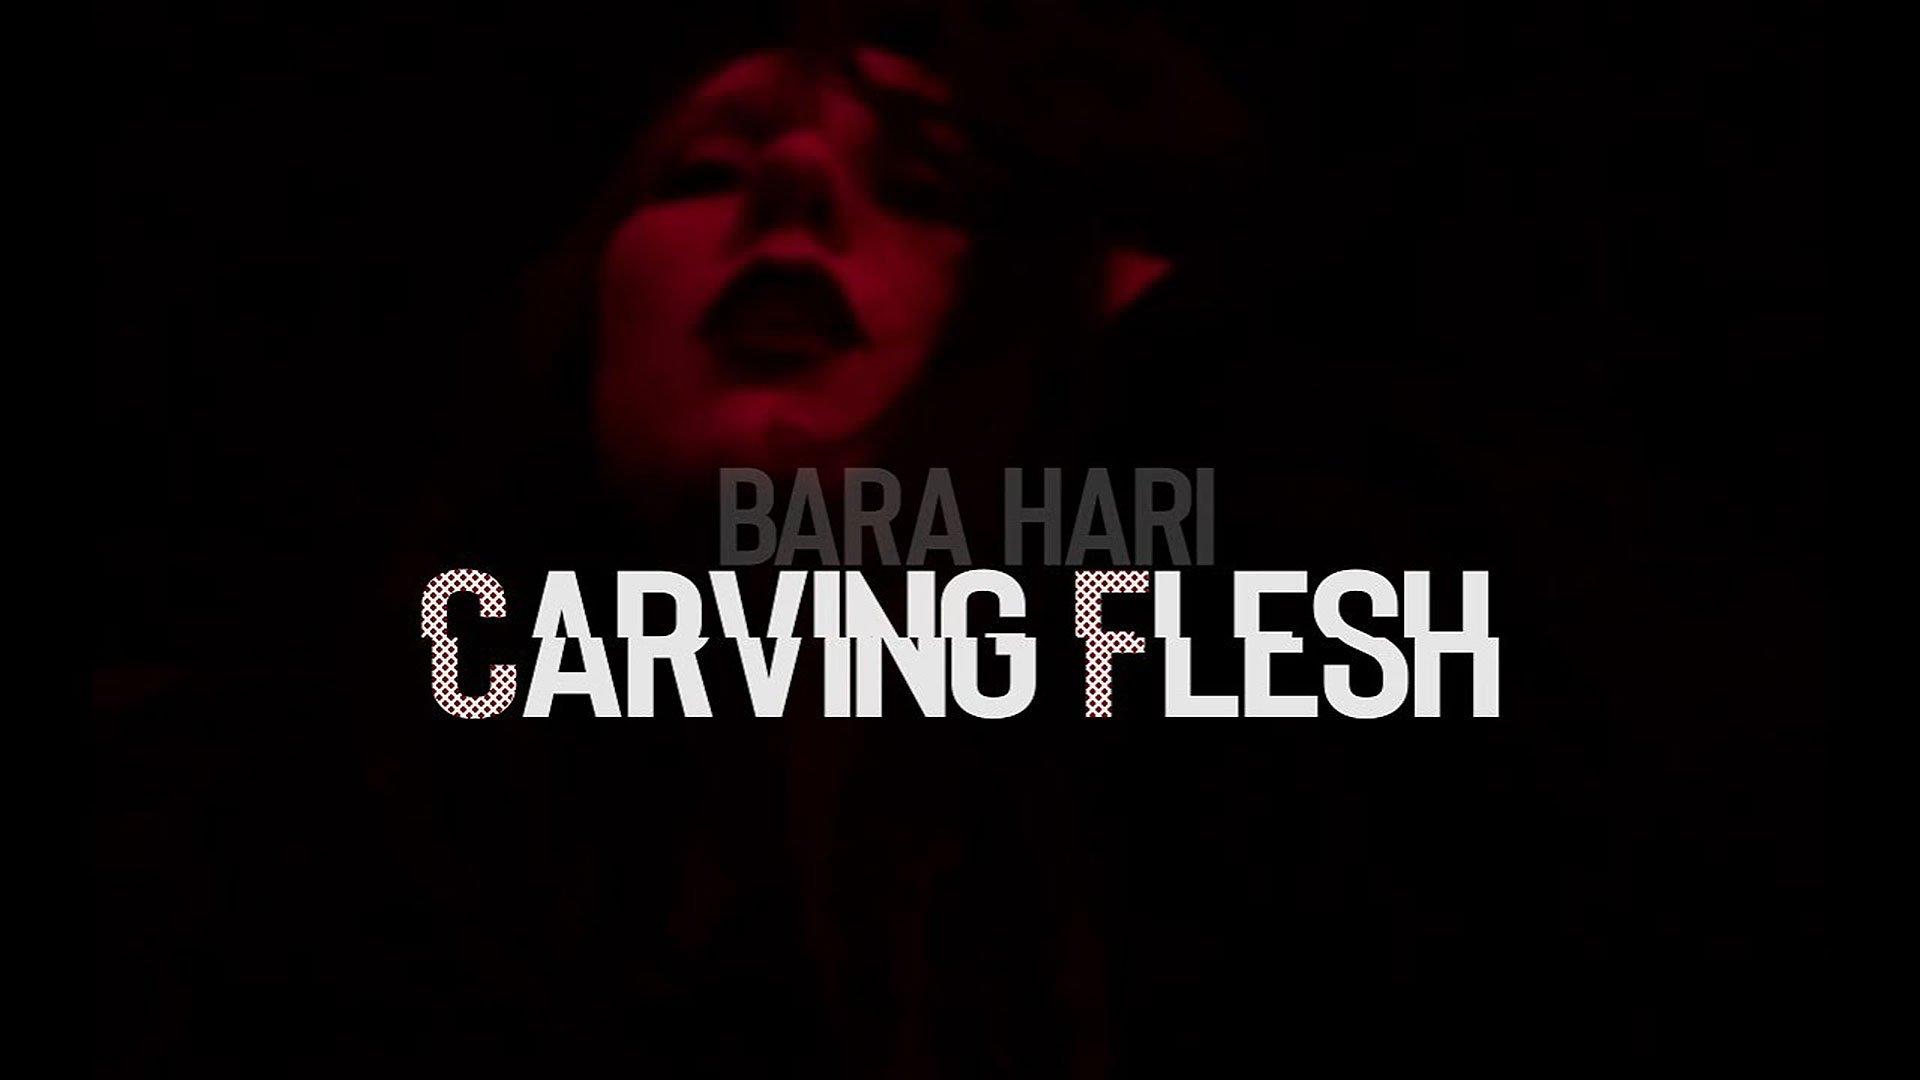 Bara Hari - Carving Flesh